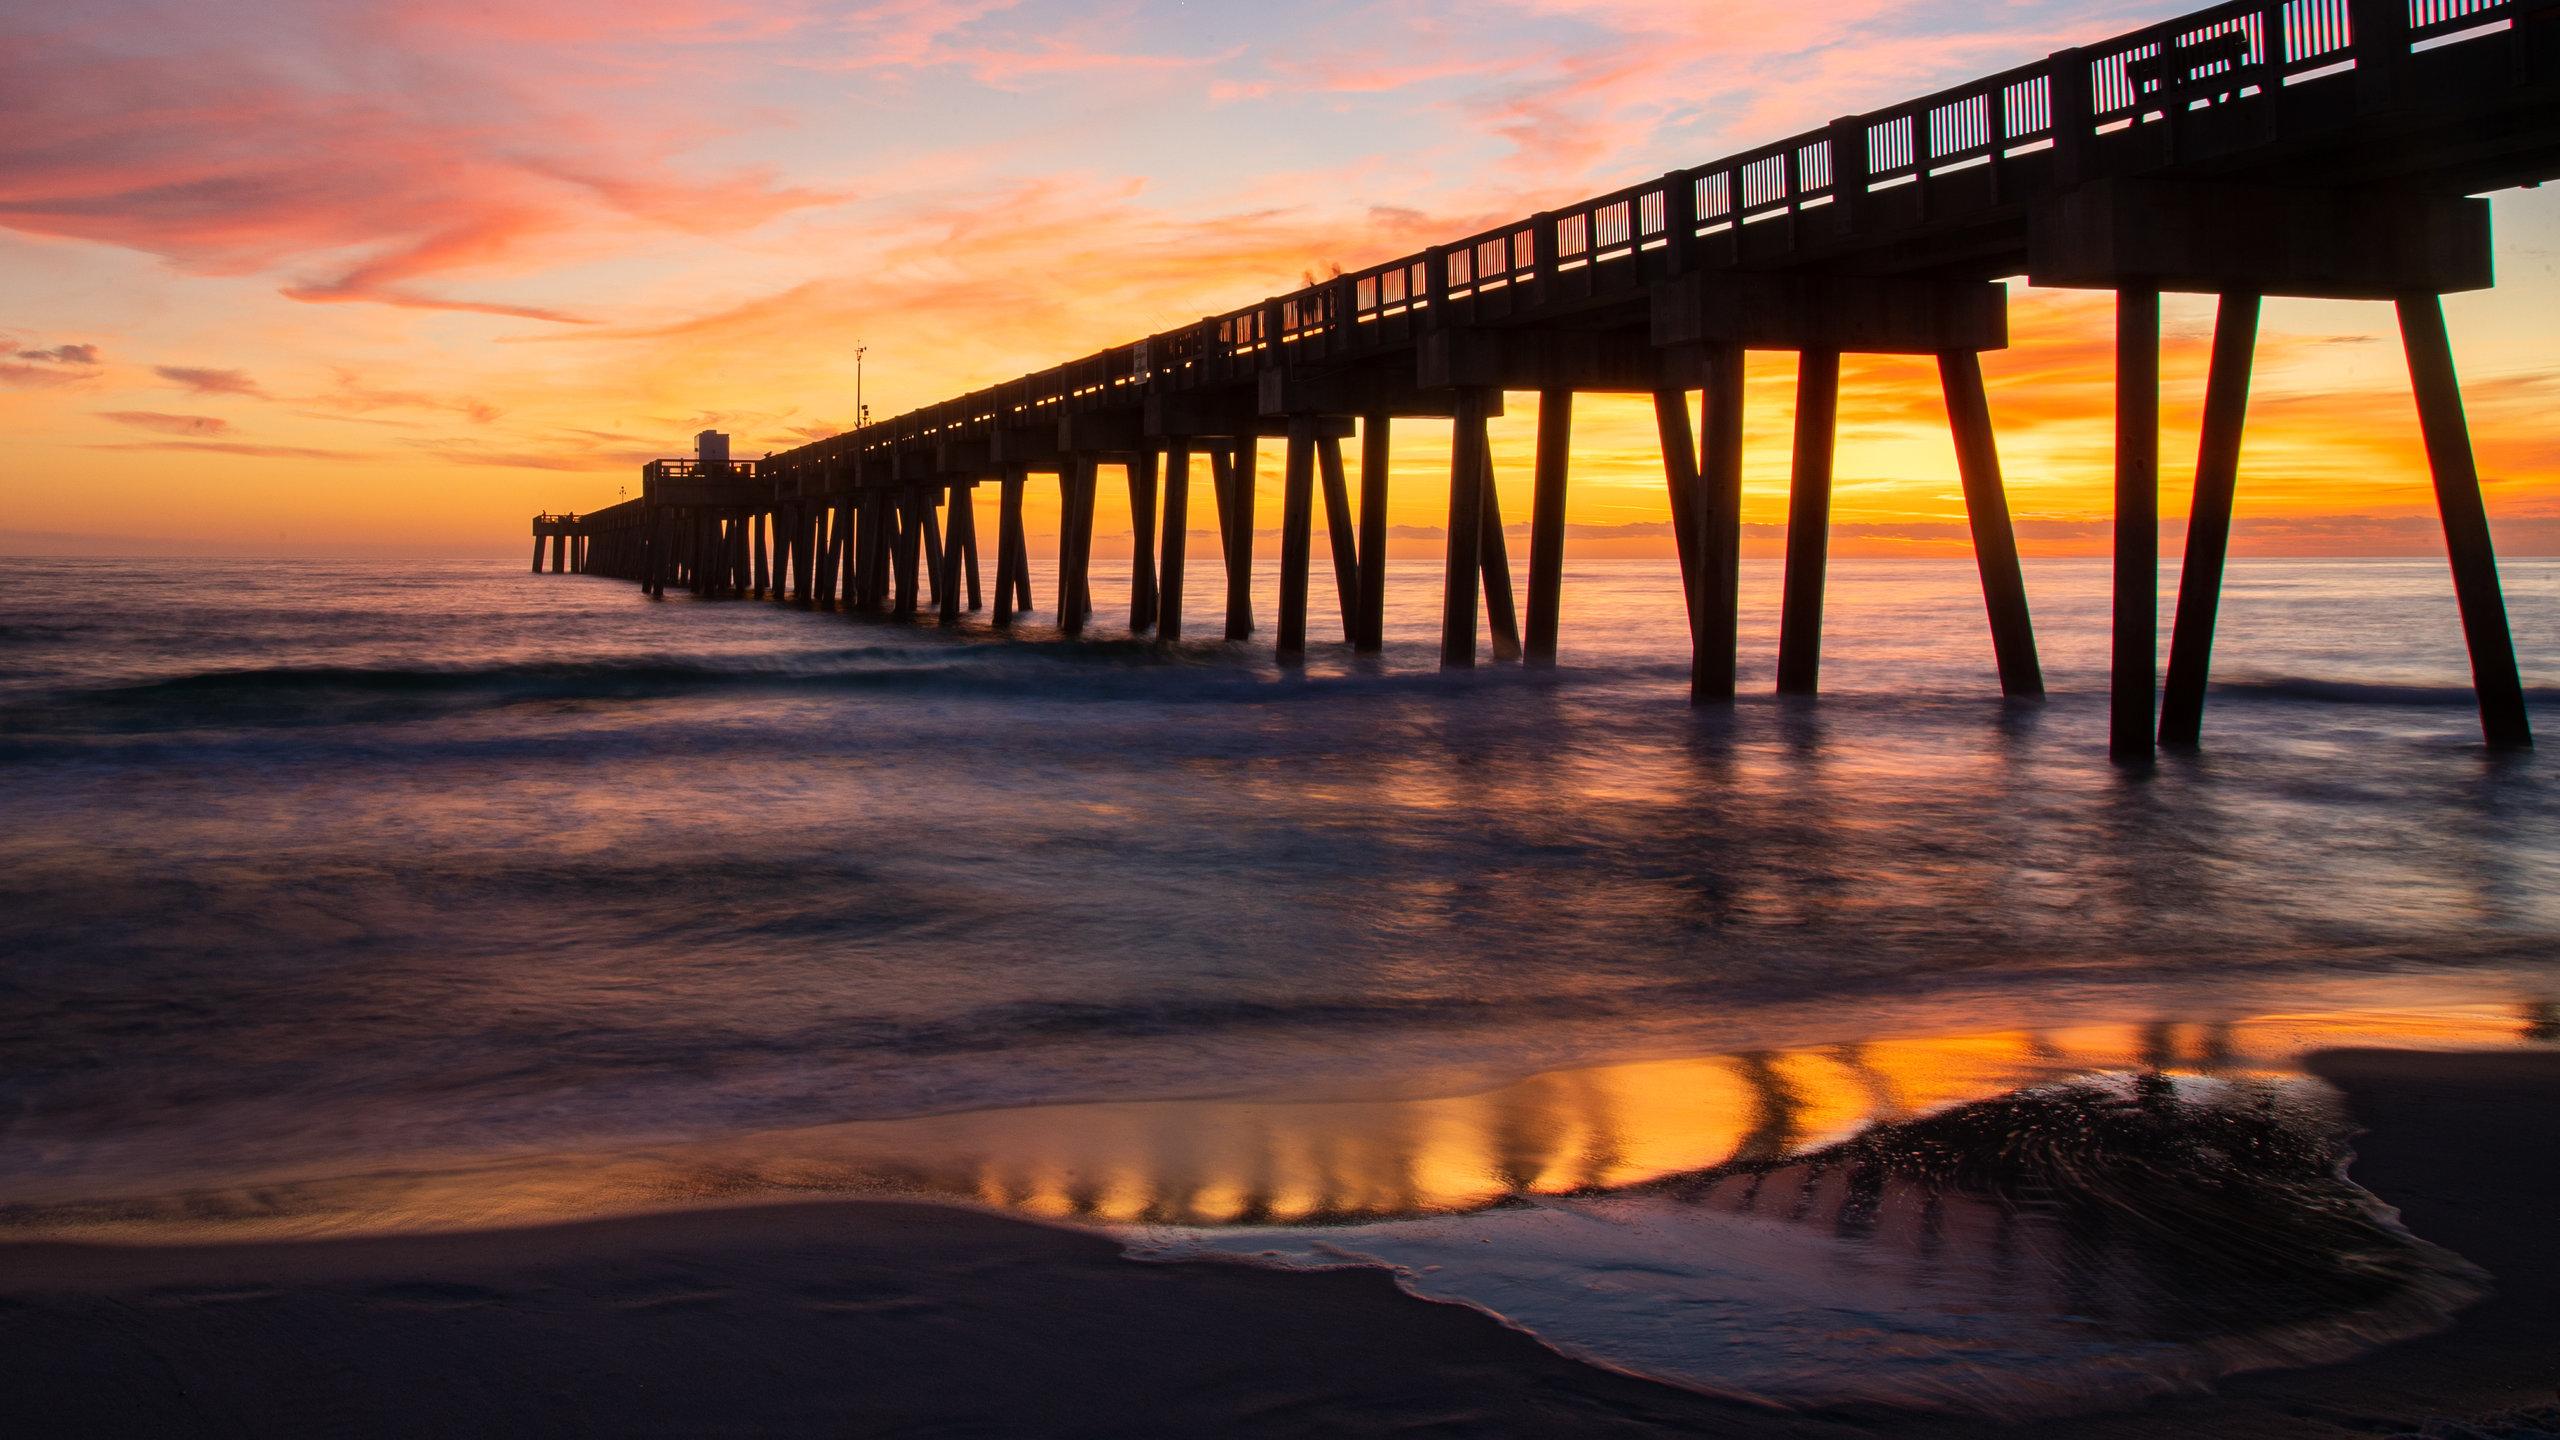 Russell-Fields Pier, Panama City Beach, Florida, United States of America